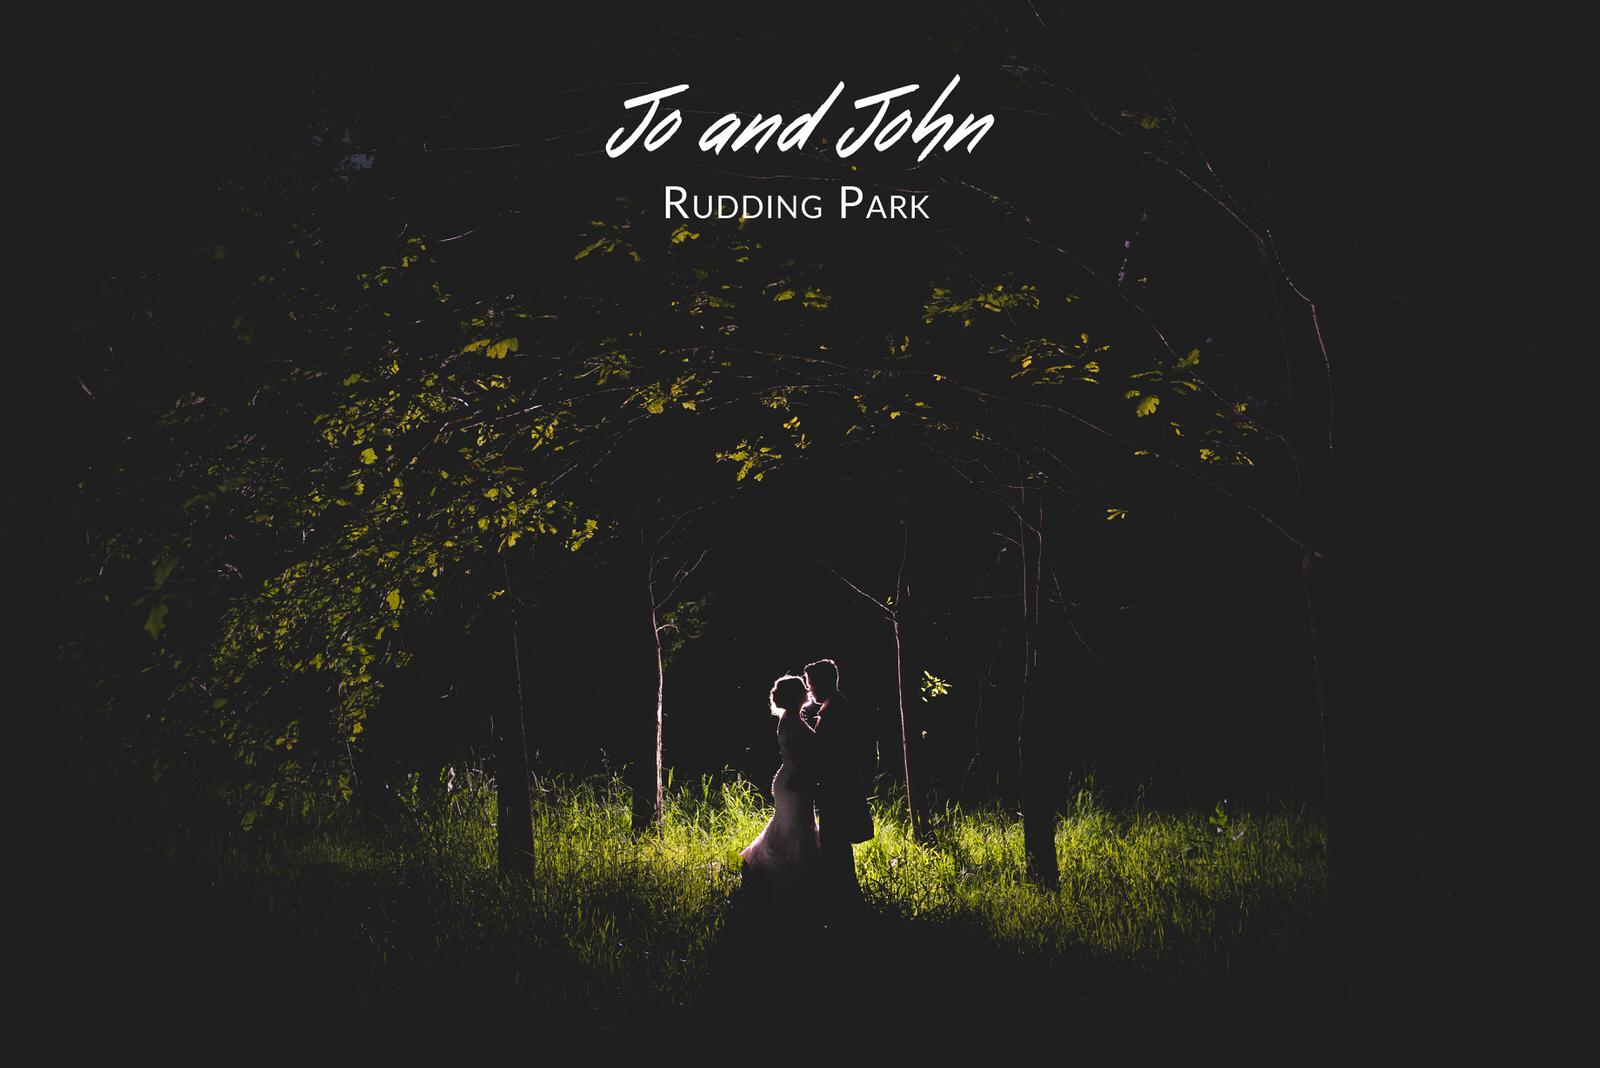 Jo and John's Wedding - Rudding Park